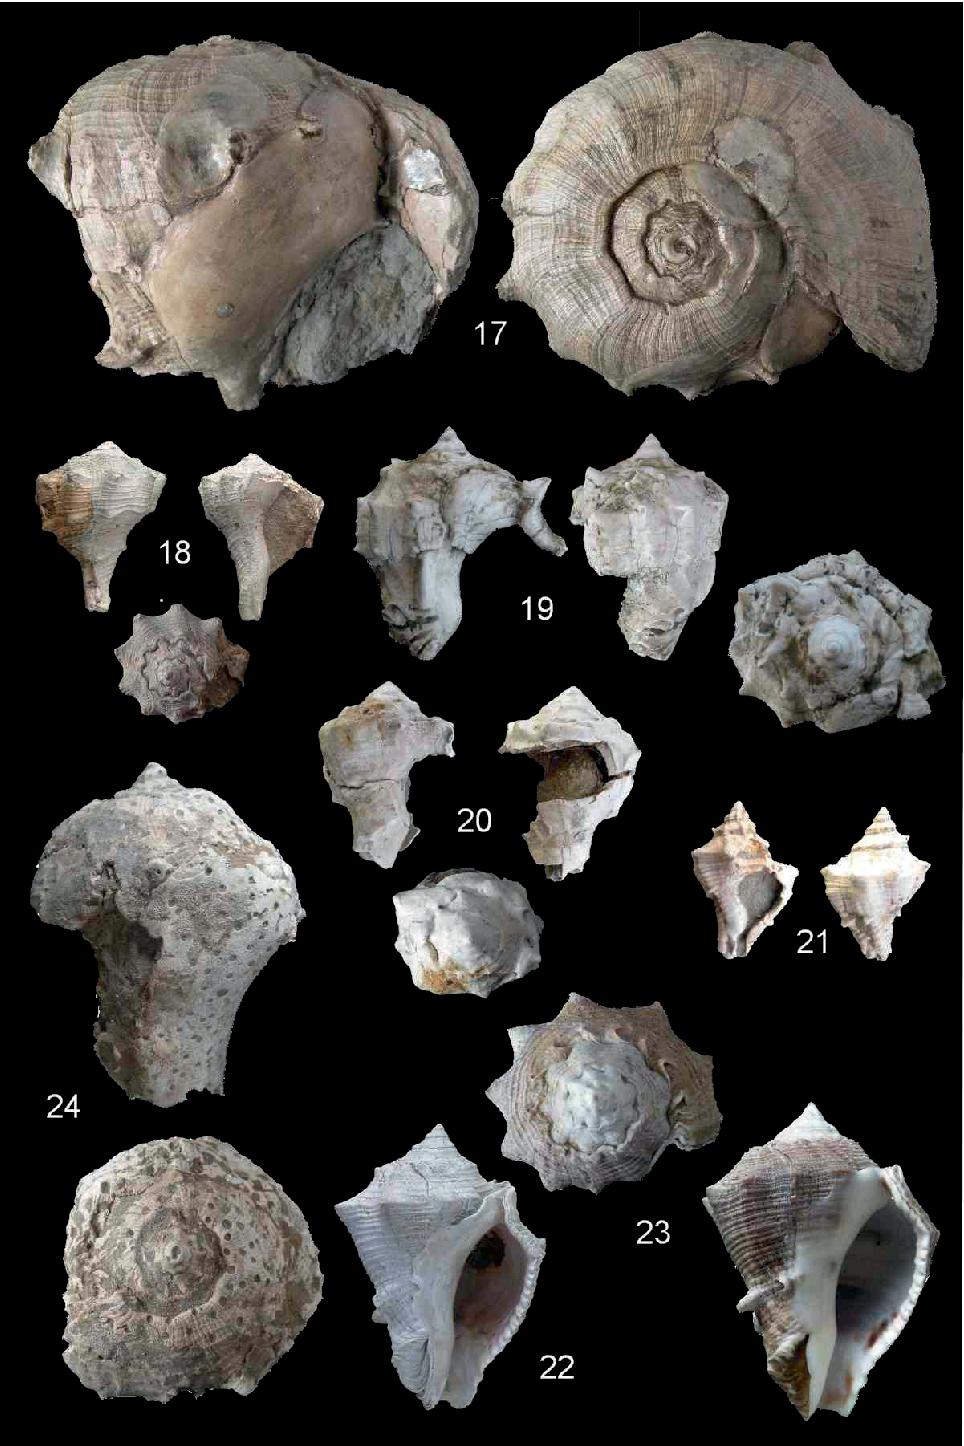 figure 20-21